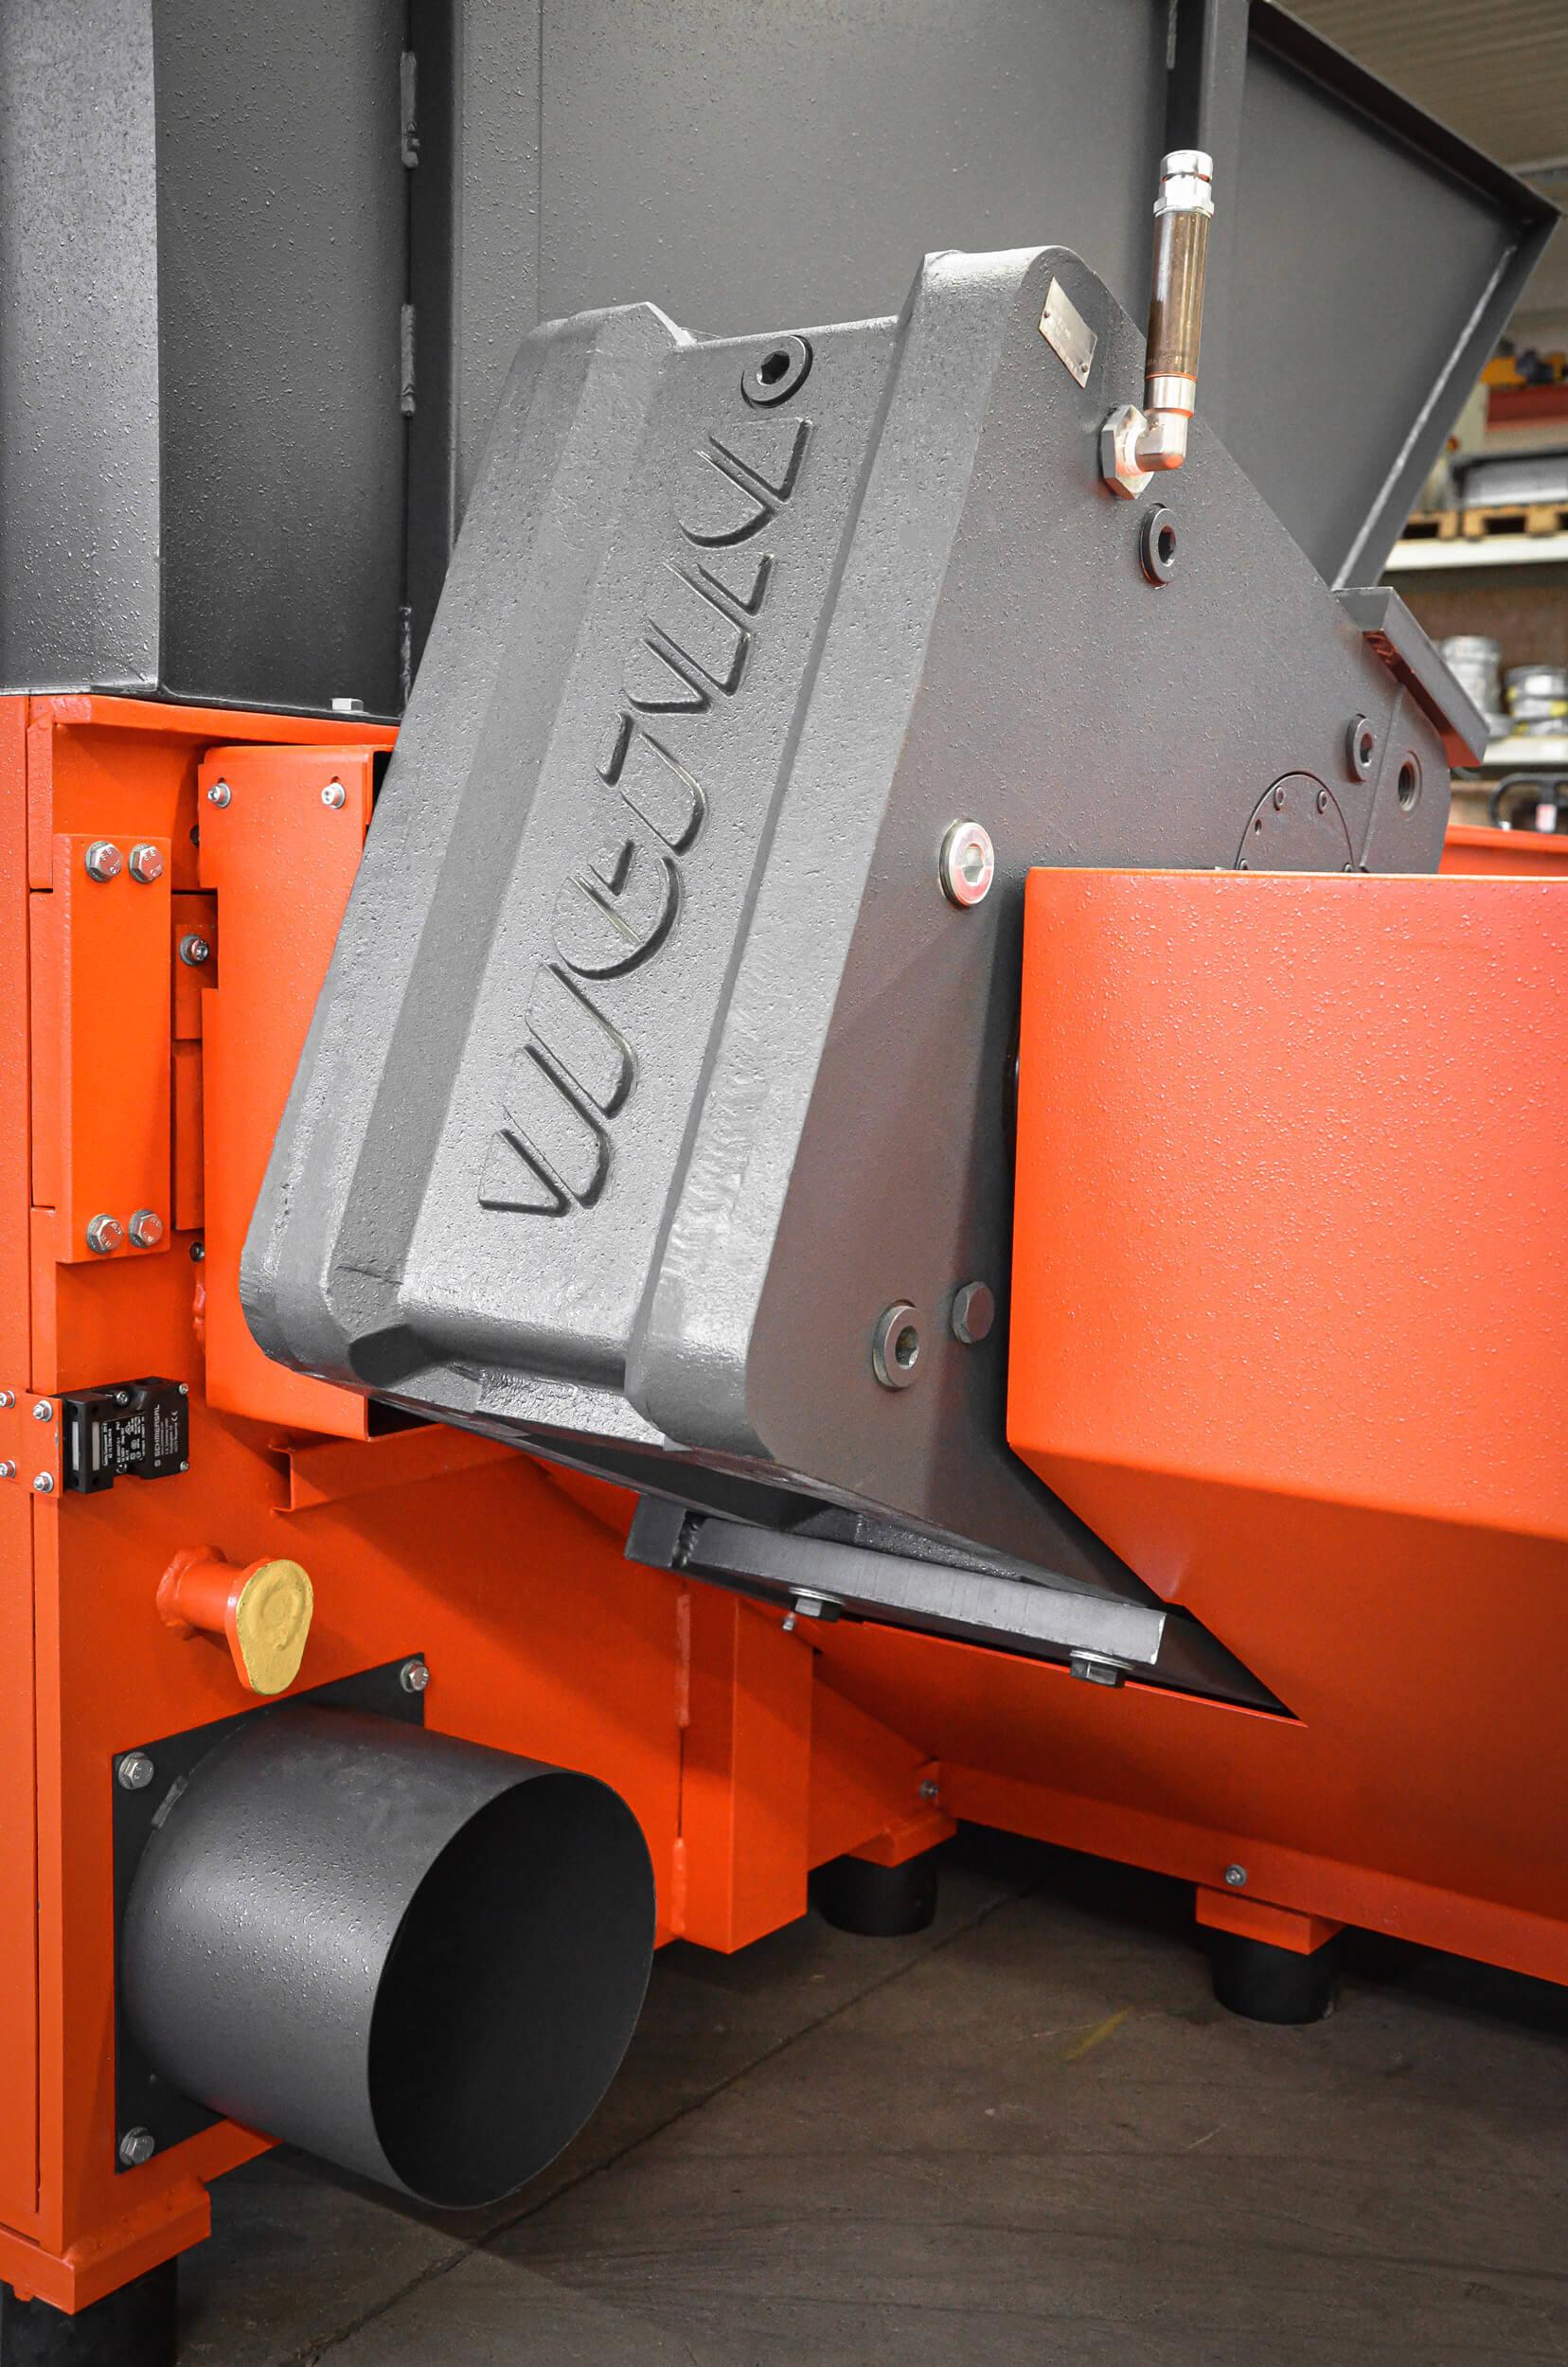 WEIMA WAP gears for electromechanical drive of WEIMA shredders